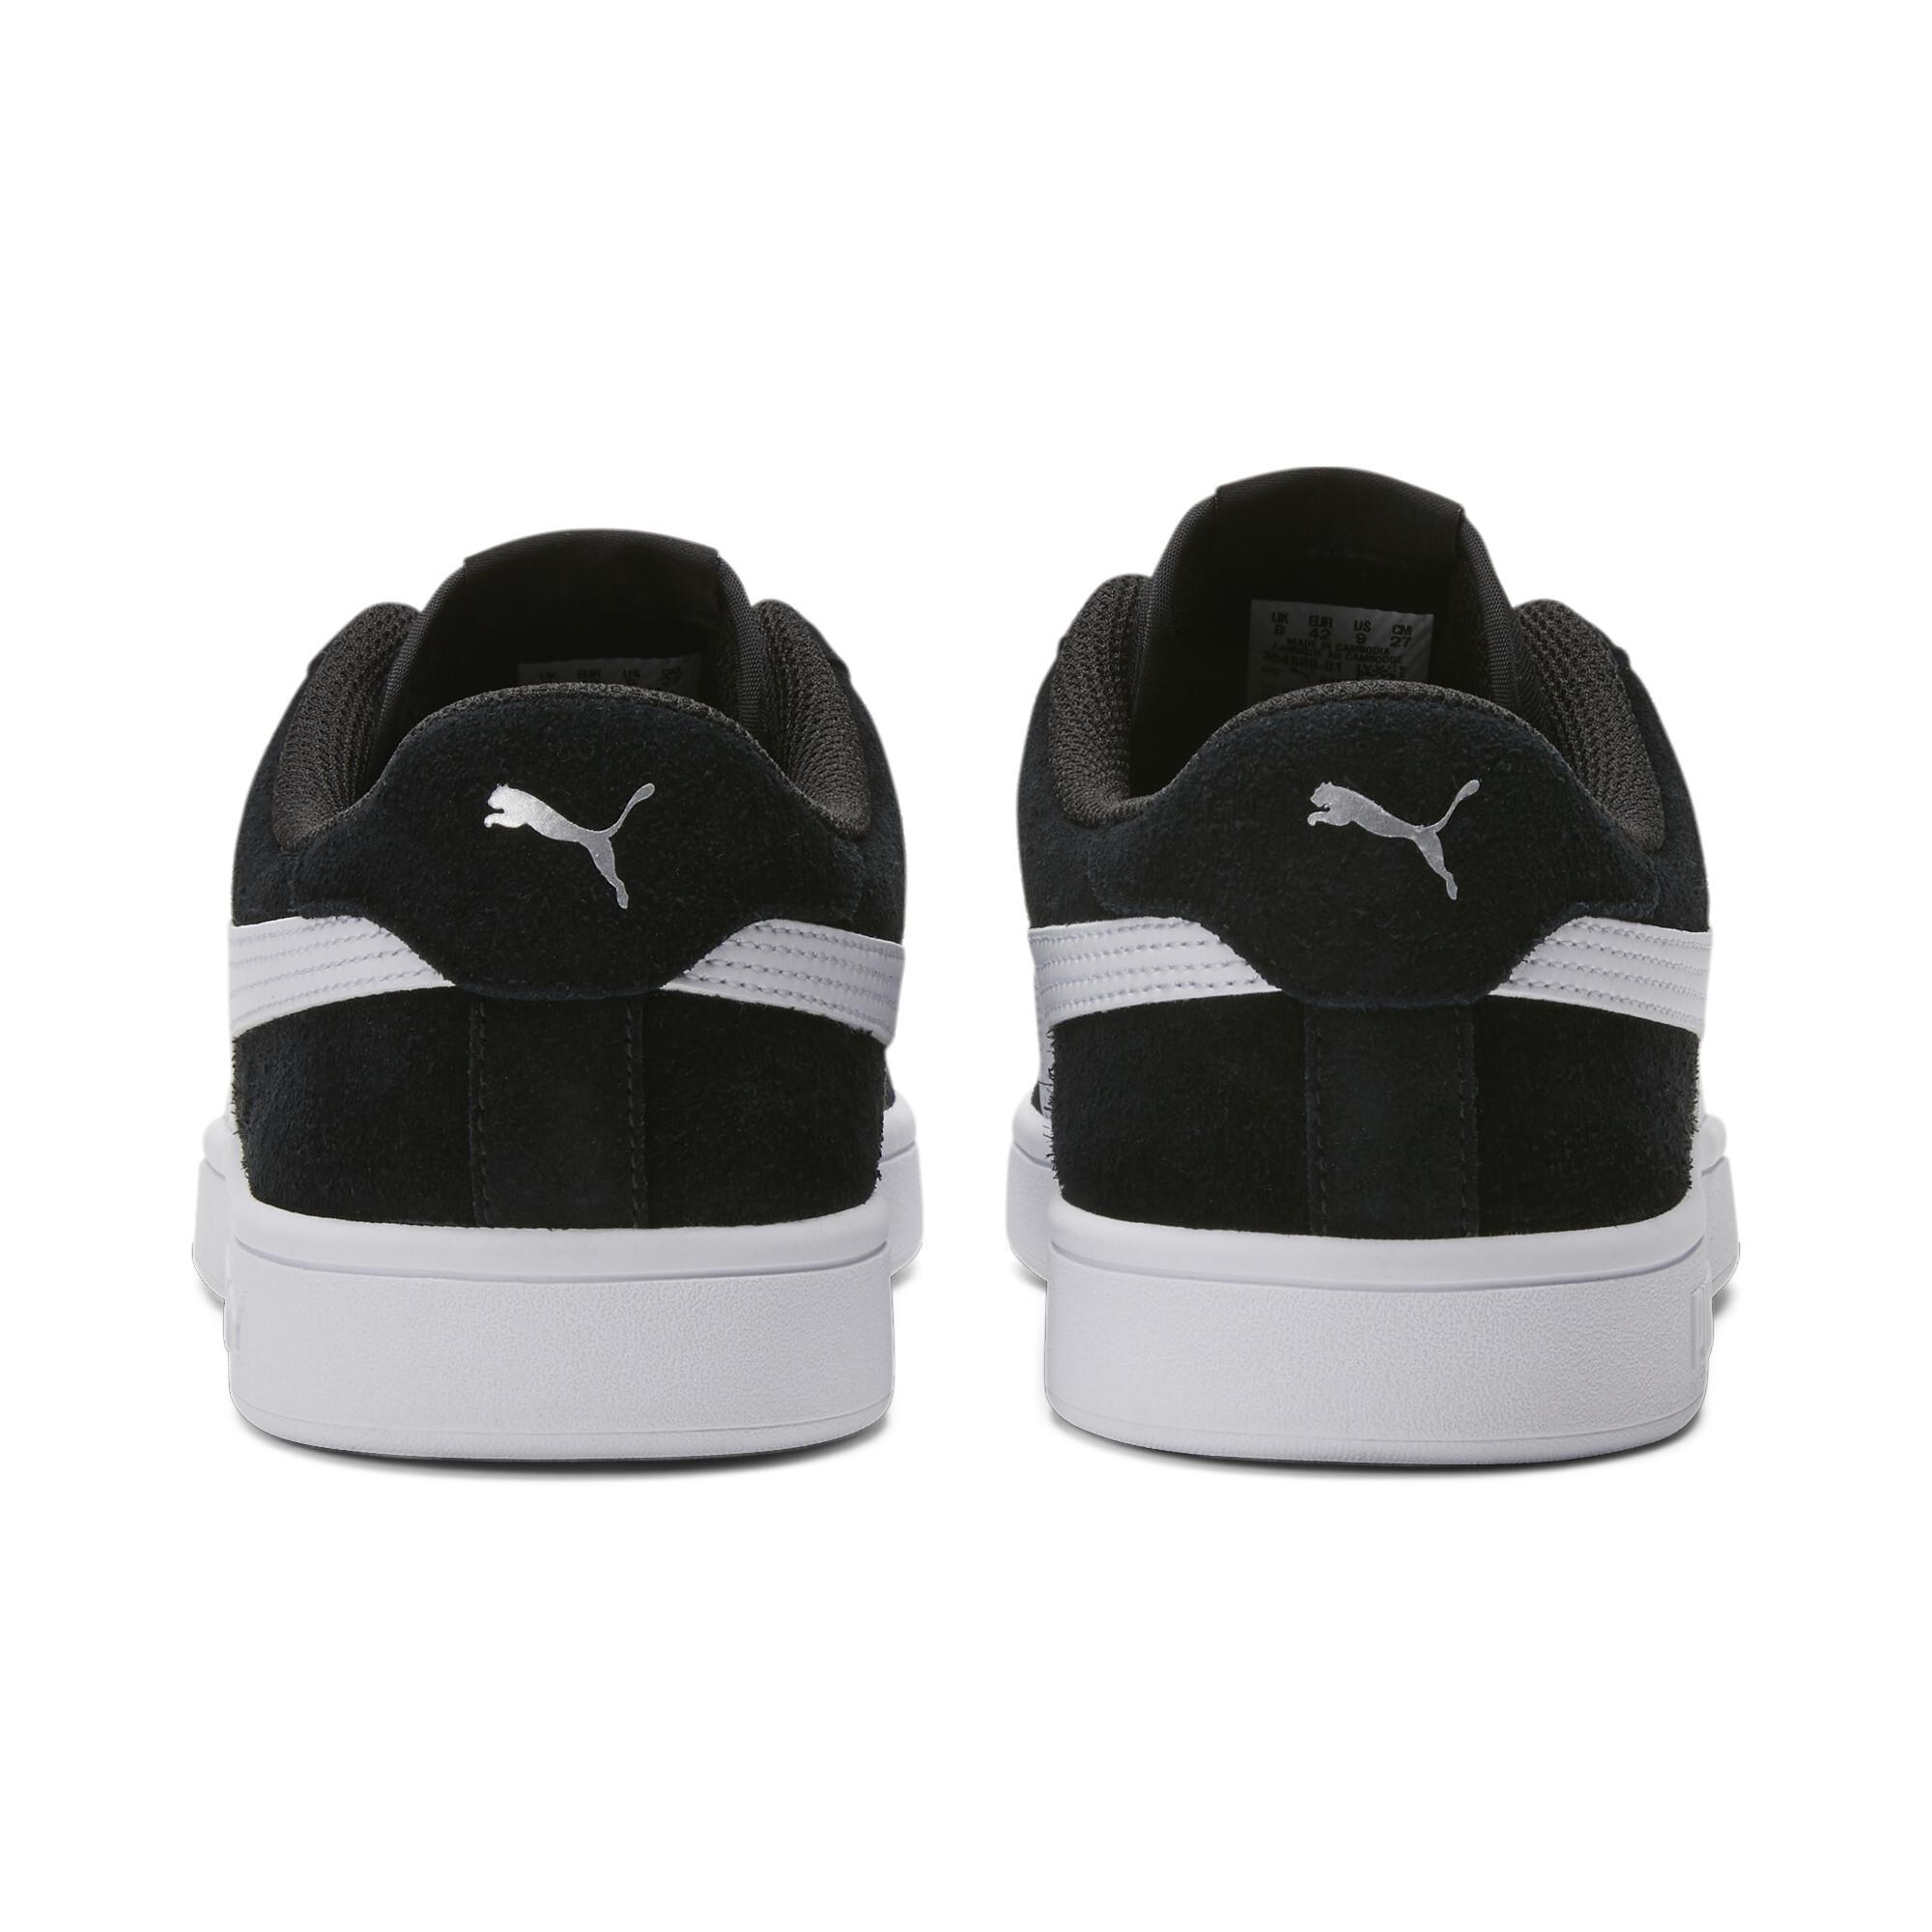 miniature 11 - Puma Men's Smash v2 Sneakers